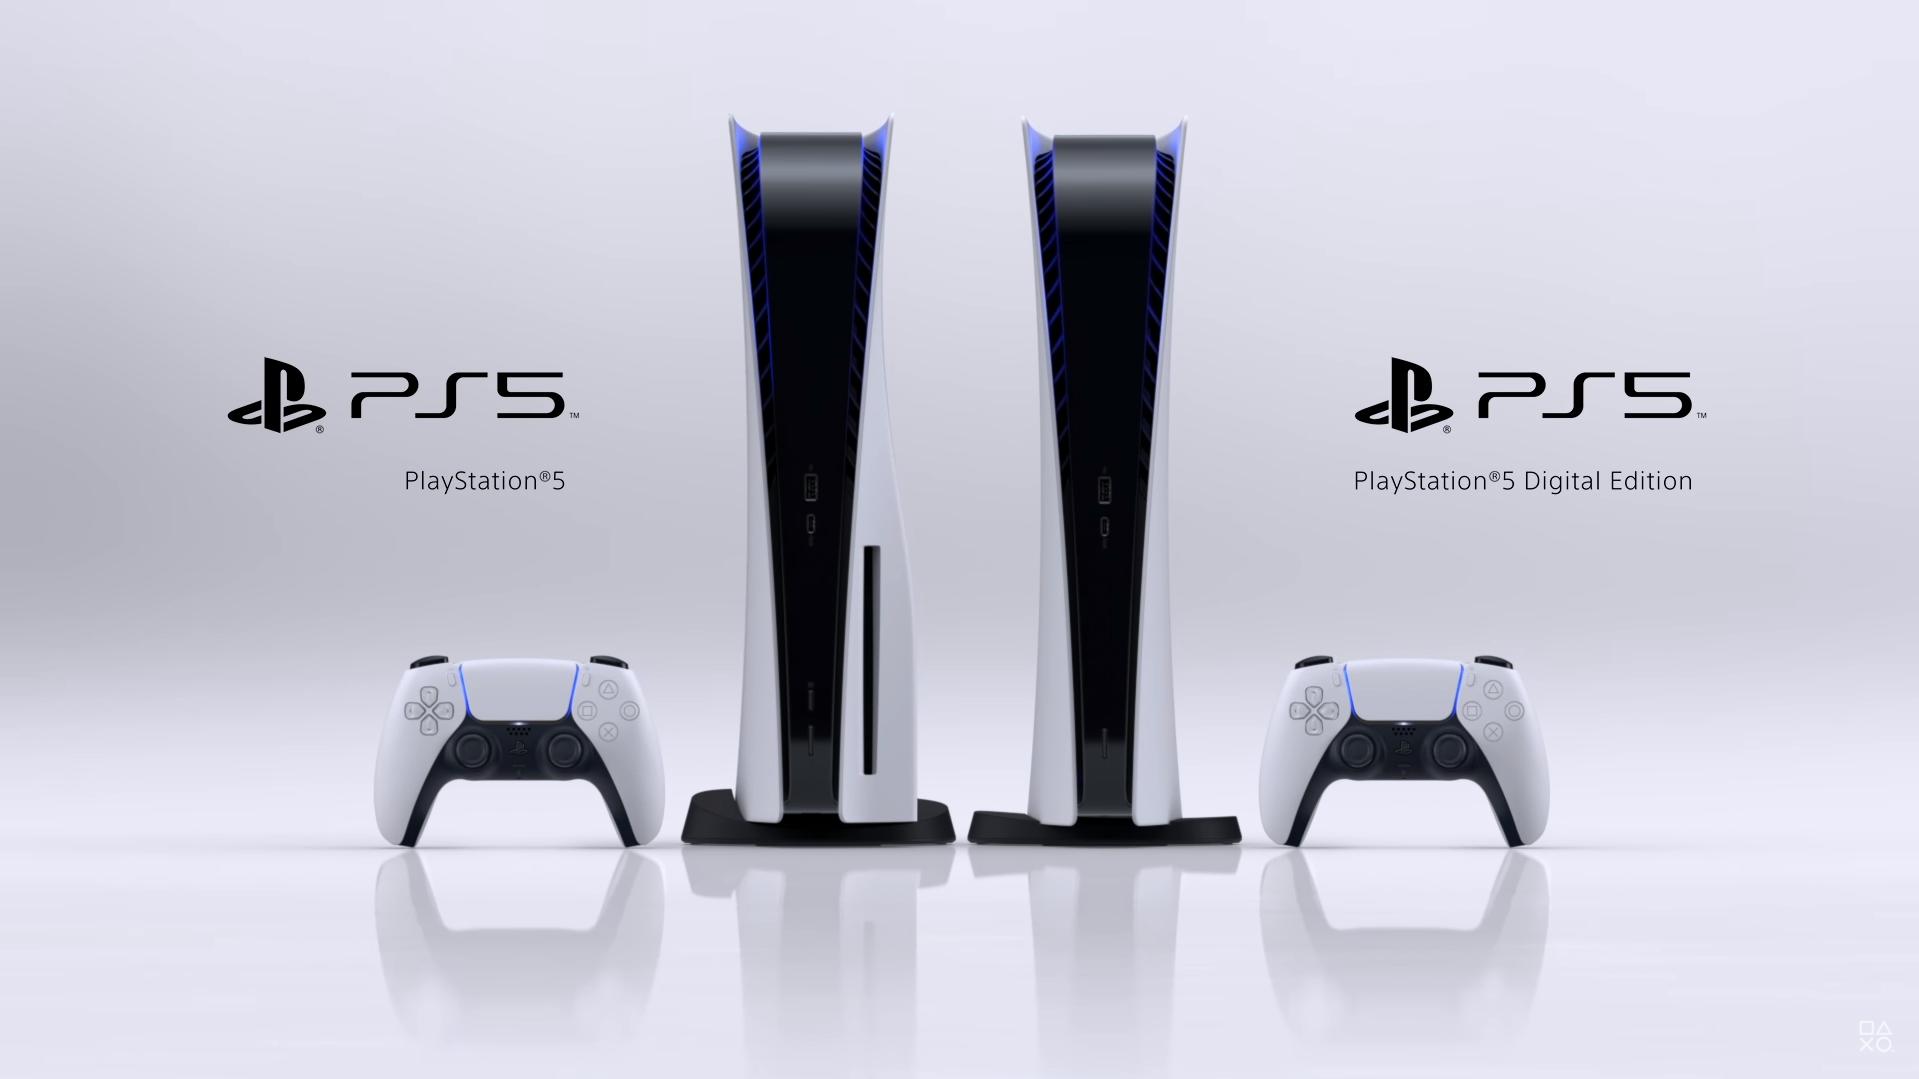 PS5 Tecnologia Inovadora